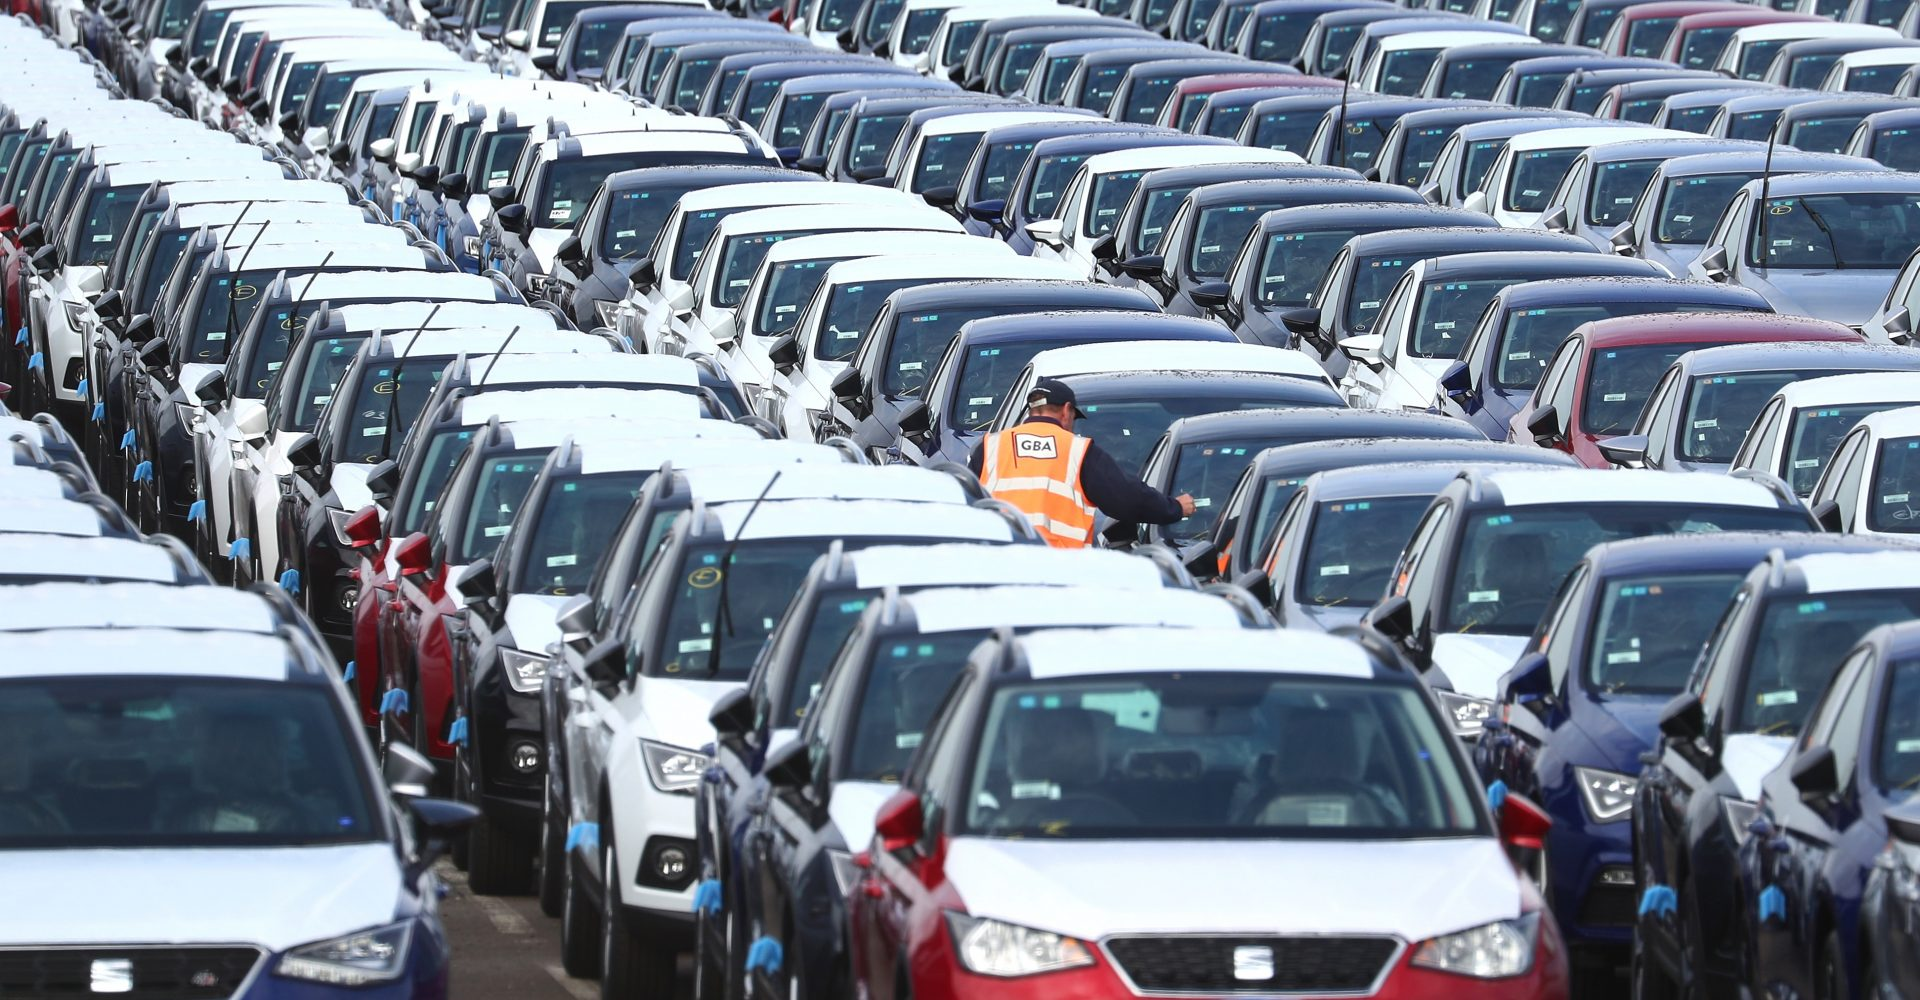 Car finance market worth close to £4.3 billion in September